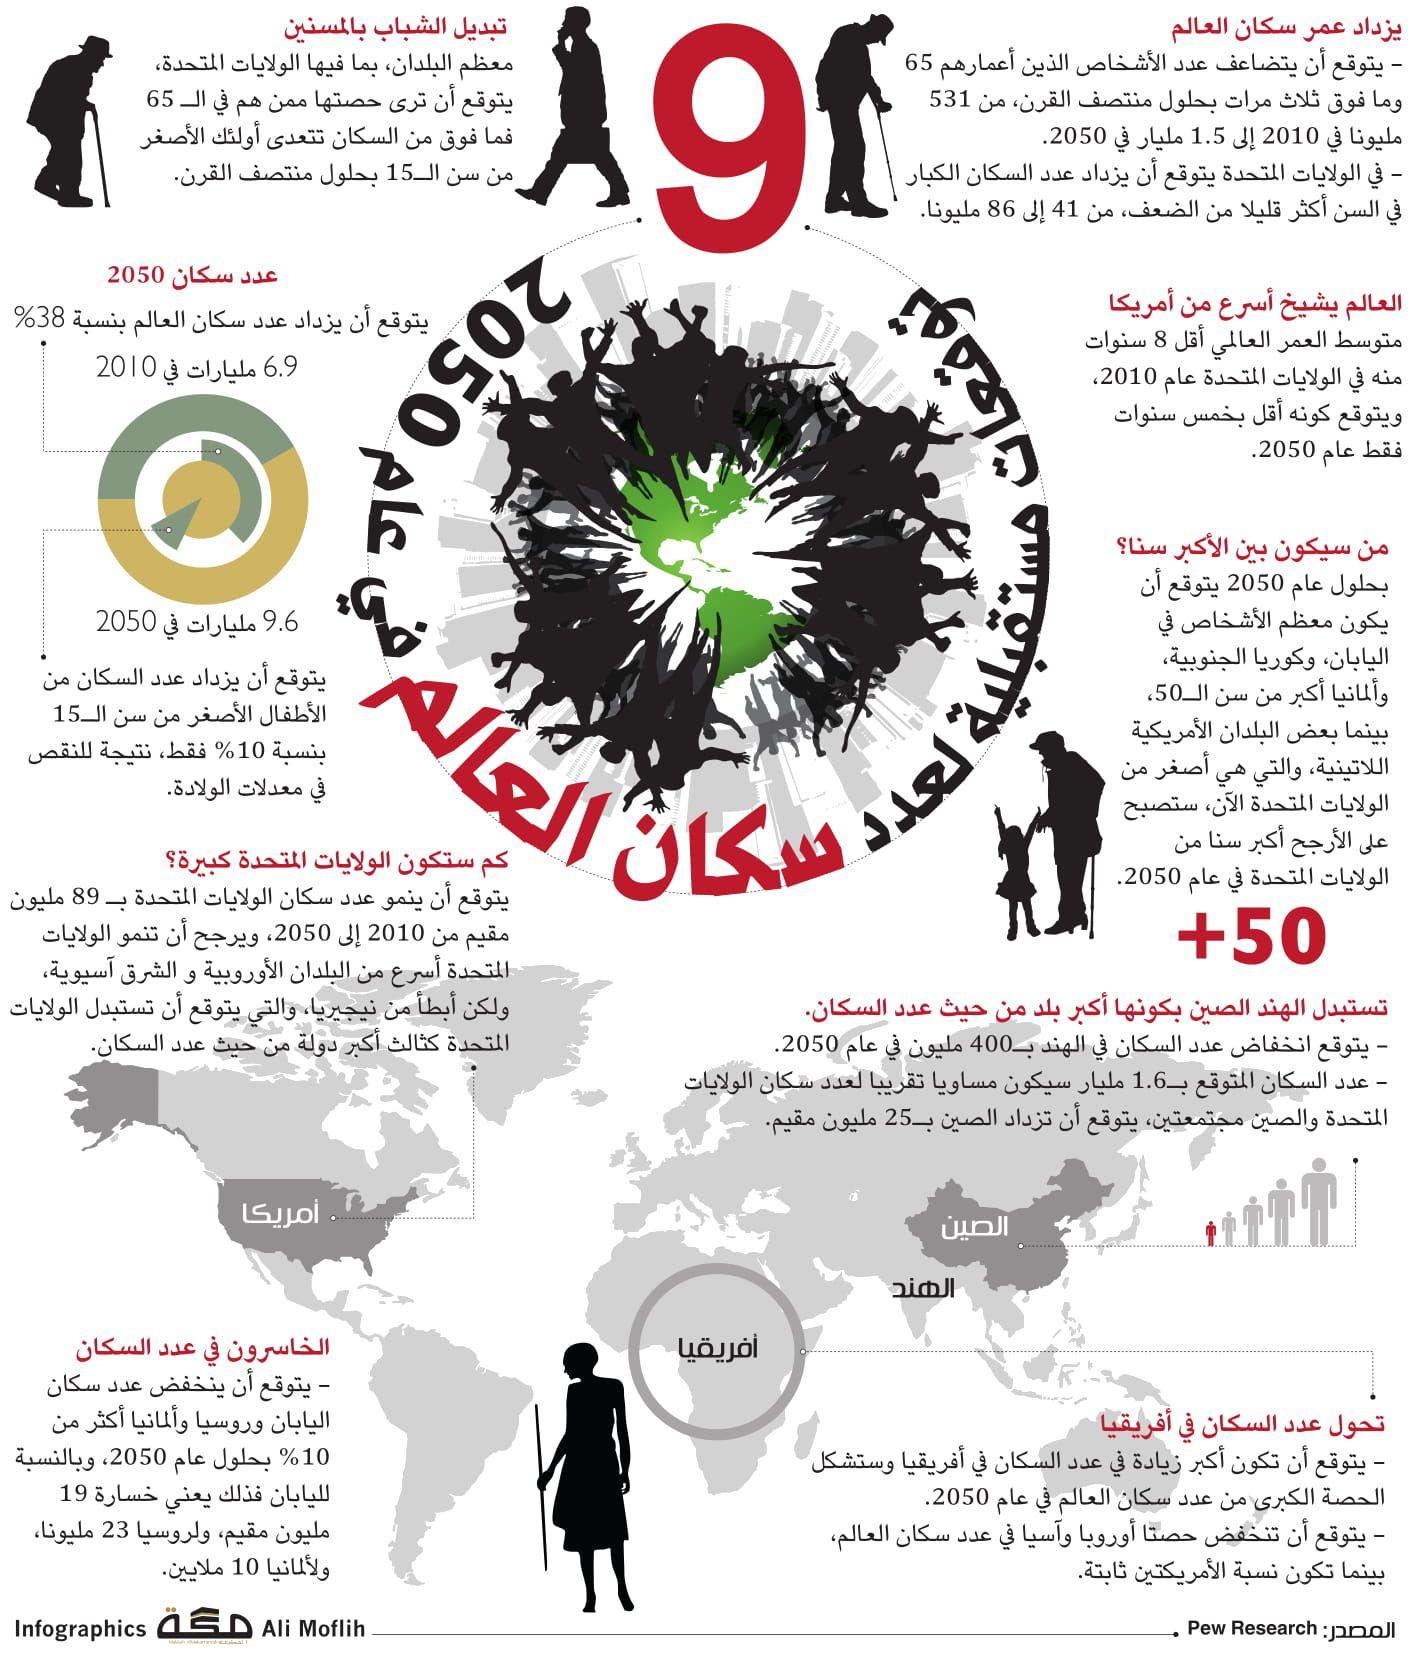 Aqidah العقيدة الصحيحة Arabic Homeschooling Files Cours Arabe Etude Langue Arabe